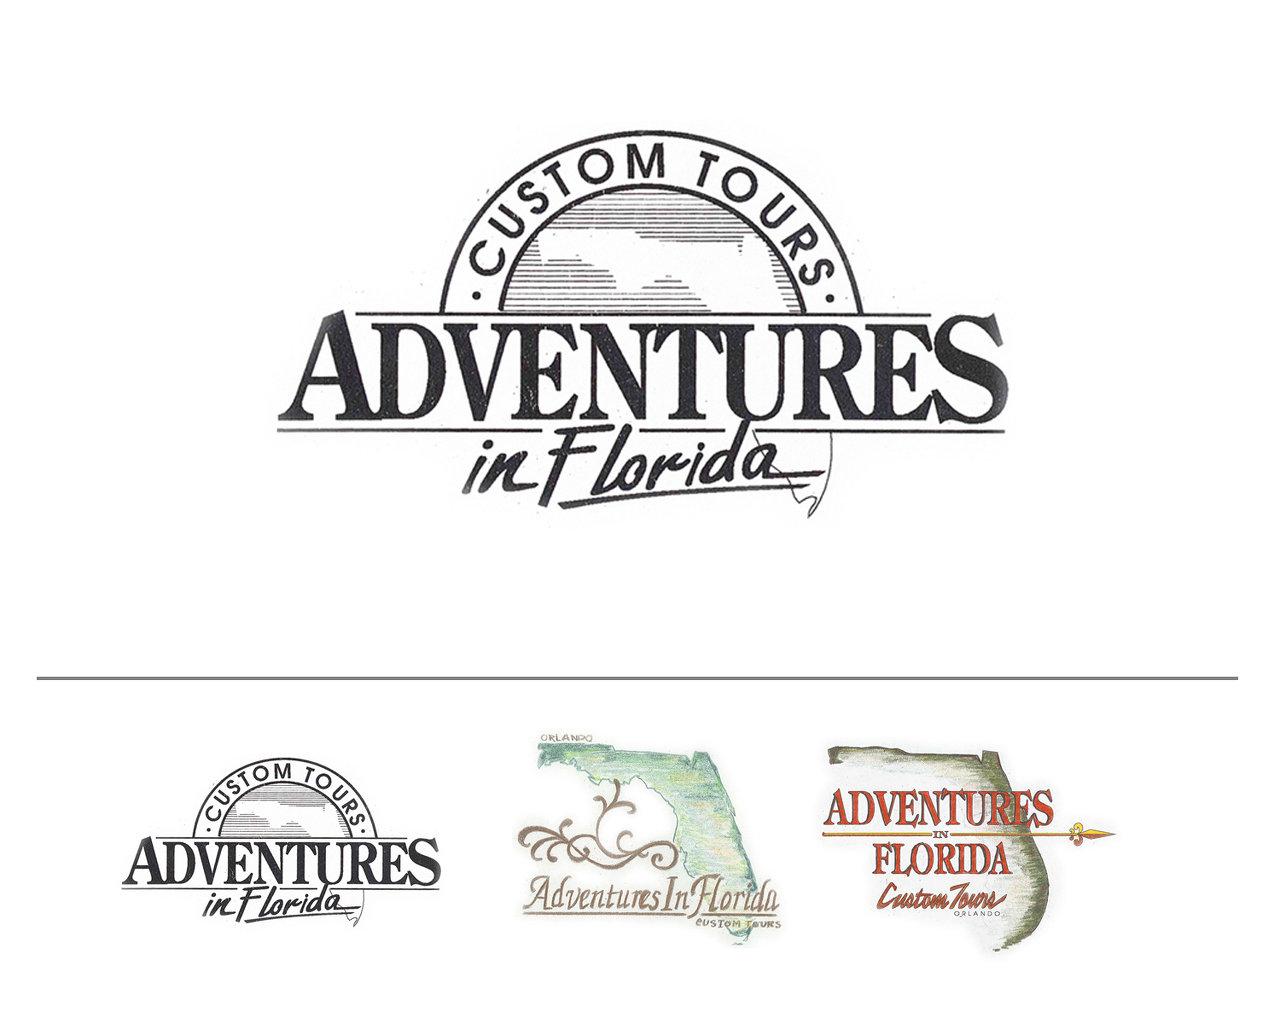 Adventures in Florida logo